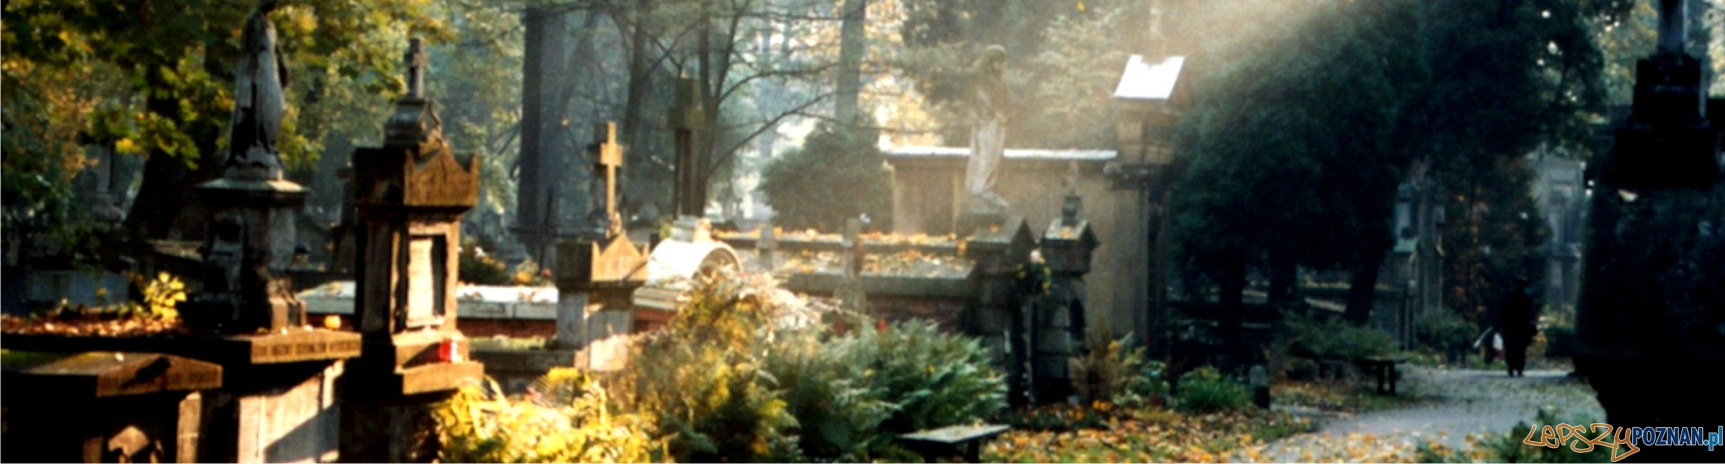 panorama cmentarz  Foto: sxc